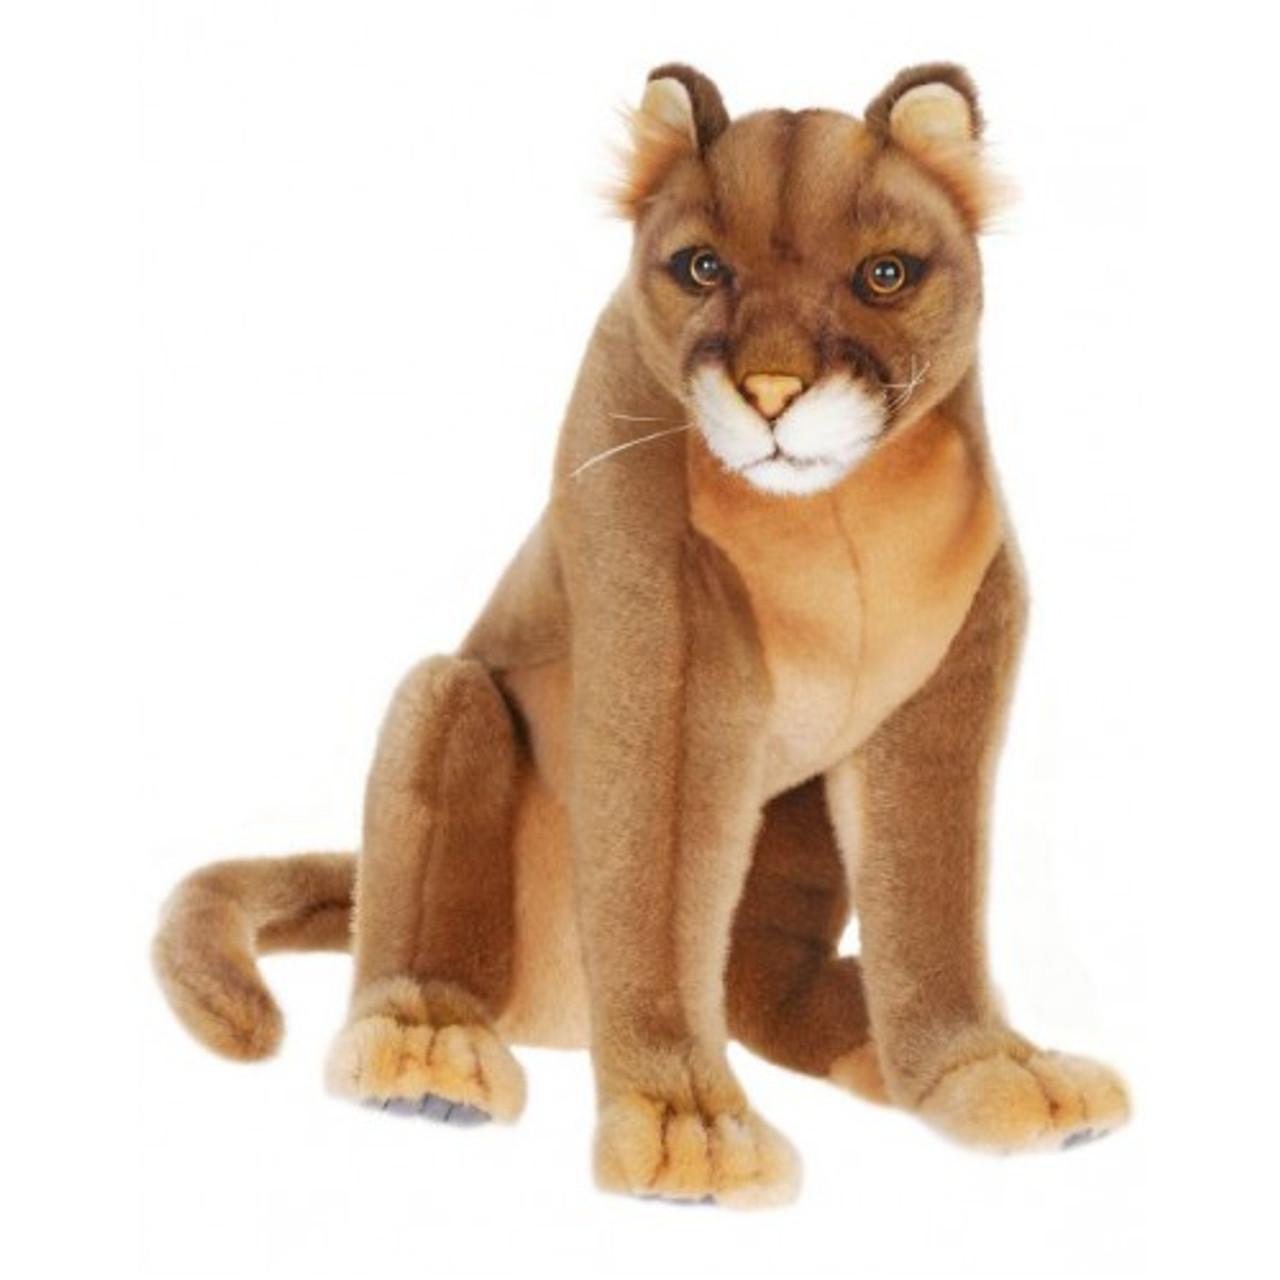 Set Of 2 Lifelike Handcrafted Extra Soft Plush Mountain Lion Cougar